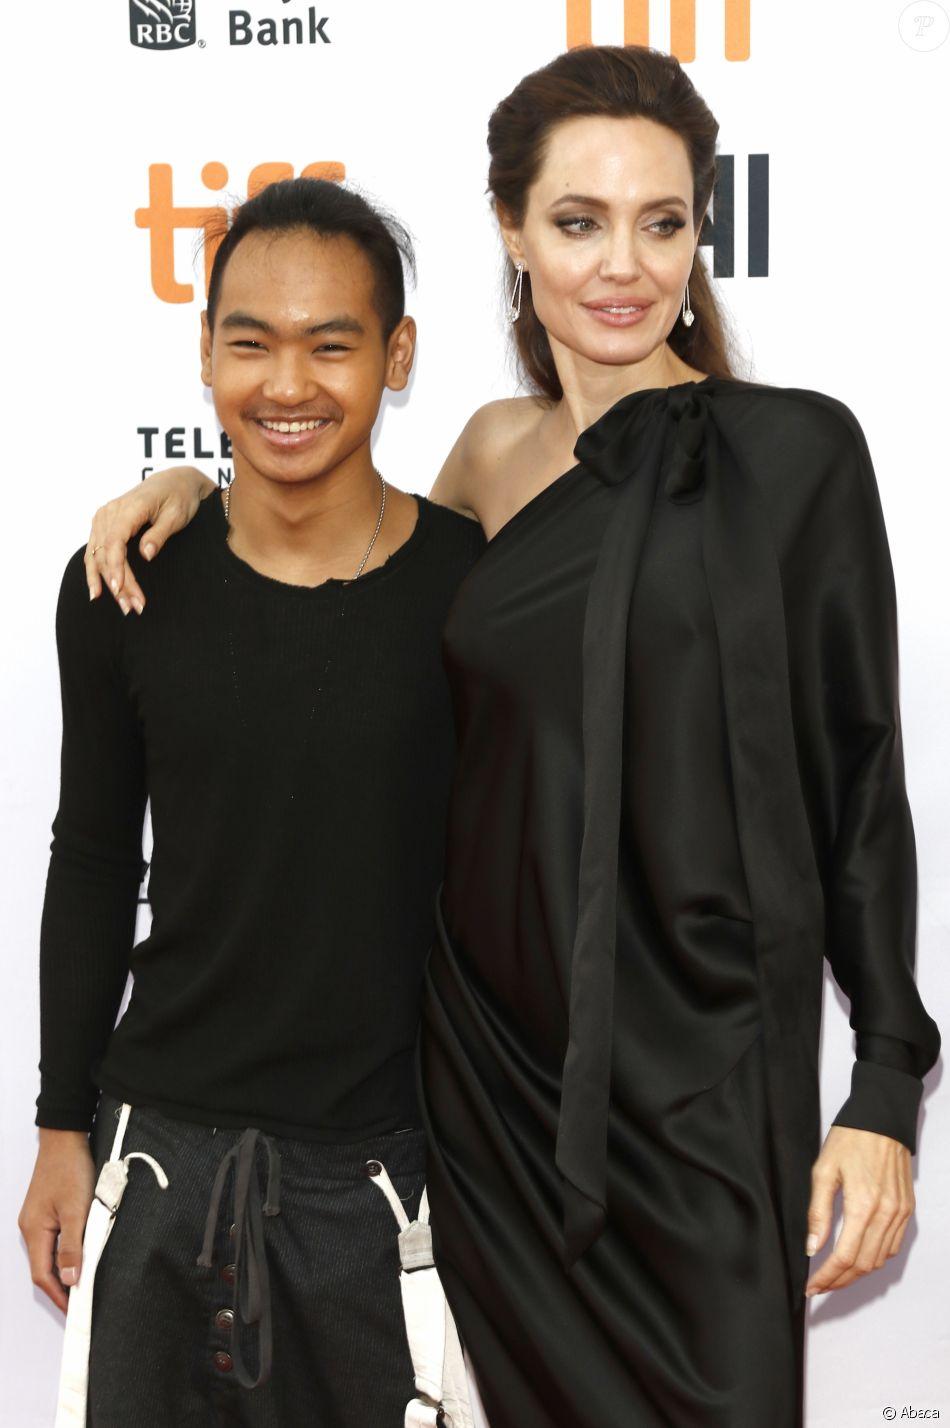 Maddox Jolie-Pitt et Angelina Jolie à la première de 'First They Killed My Father: A Daughter of Cambodia Remembers' au Toronto International Film Festival le 11 septembre 2017.